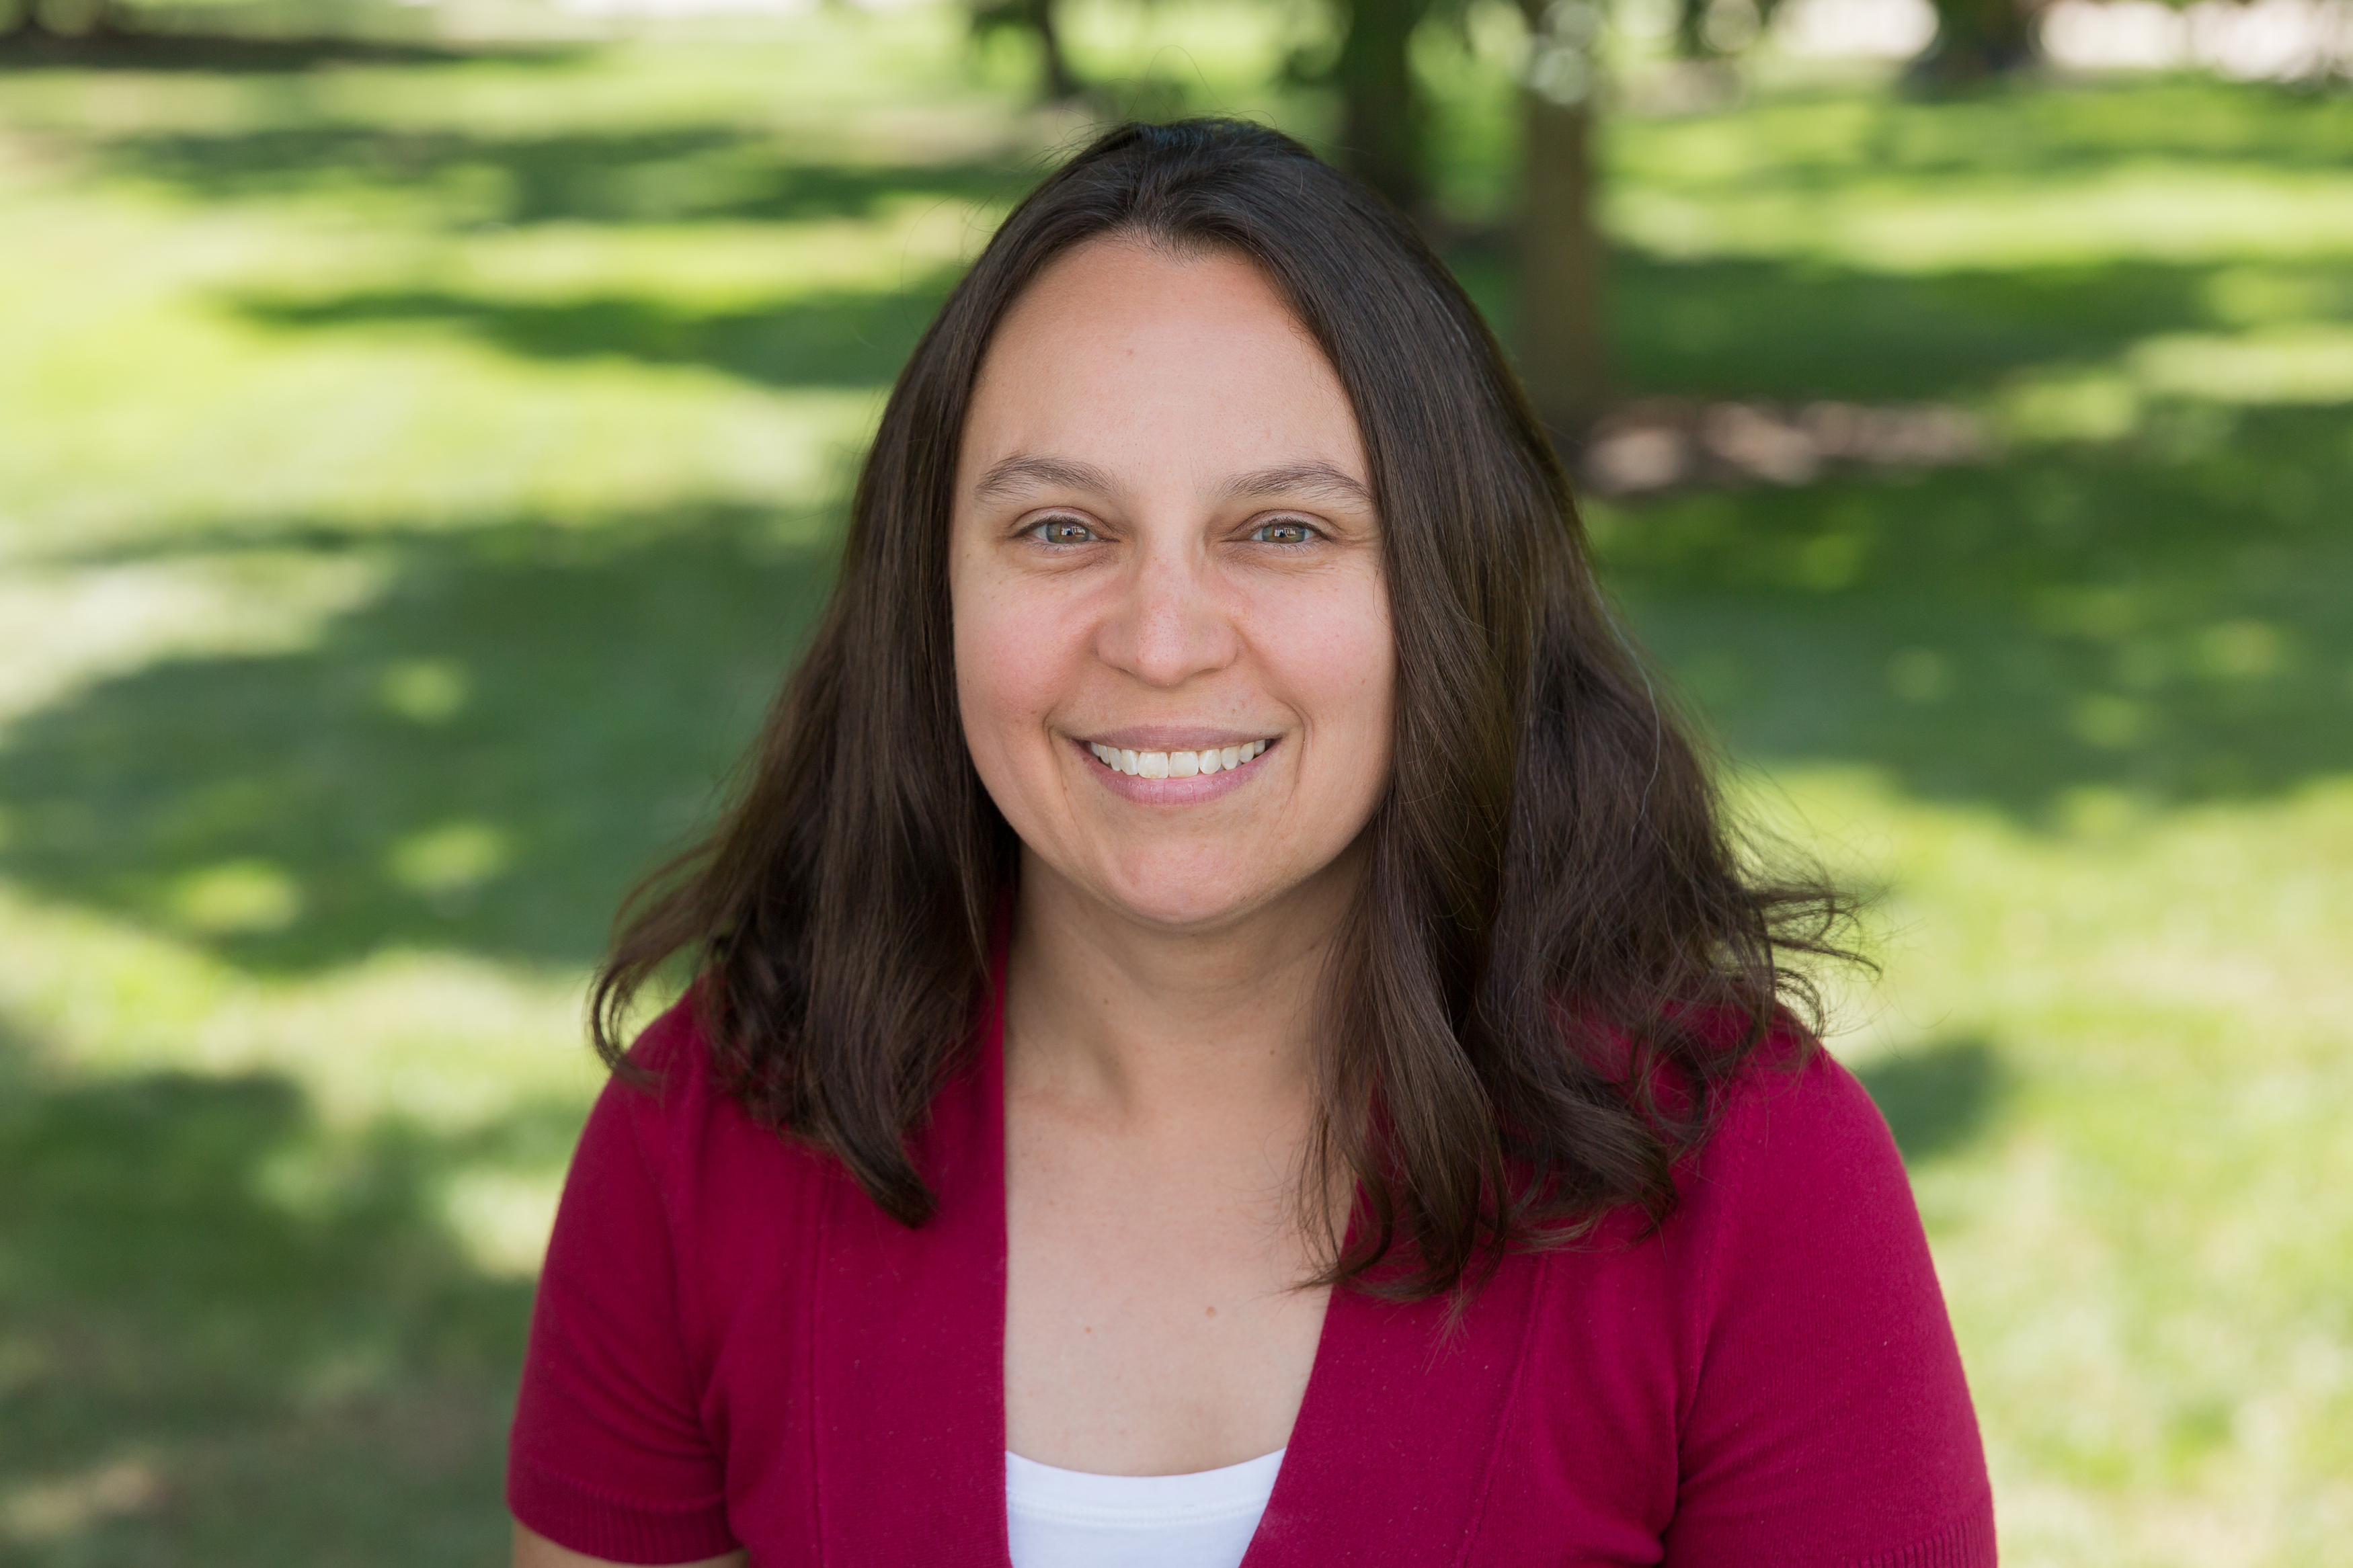 Mathematics Professor Beth Campbell Hetrick (Photo courtesy of Gettysburg College)